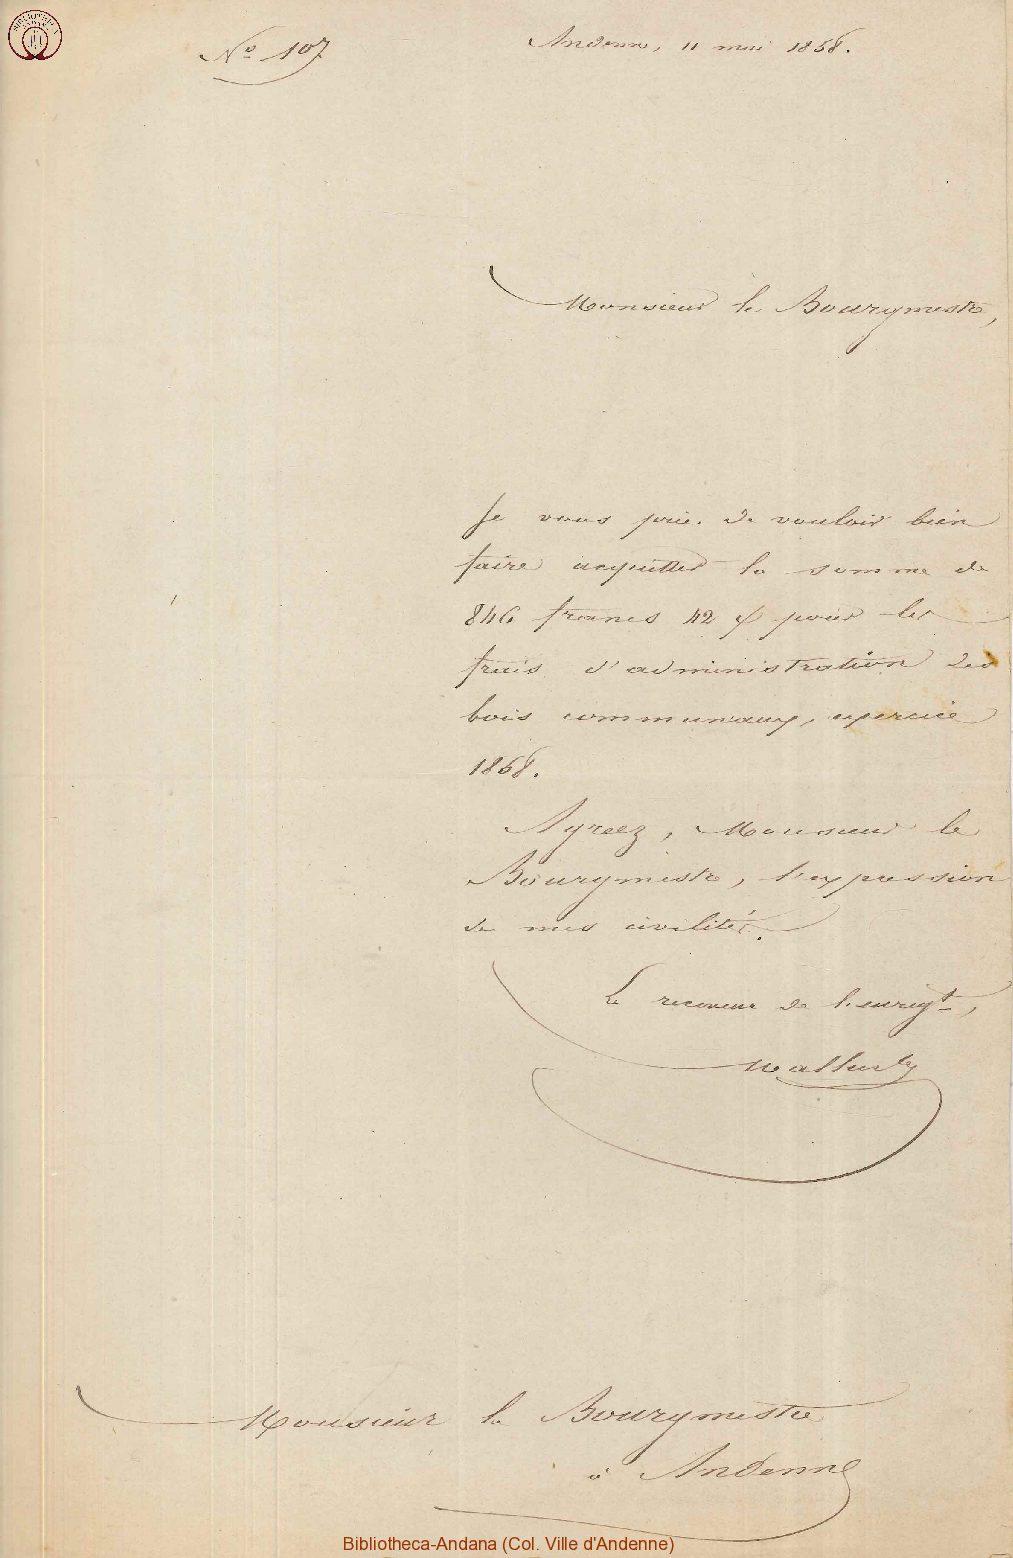 1868-05-11